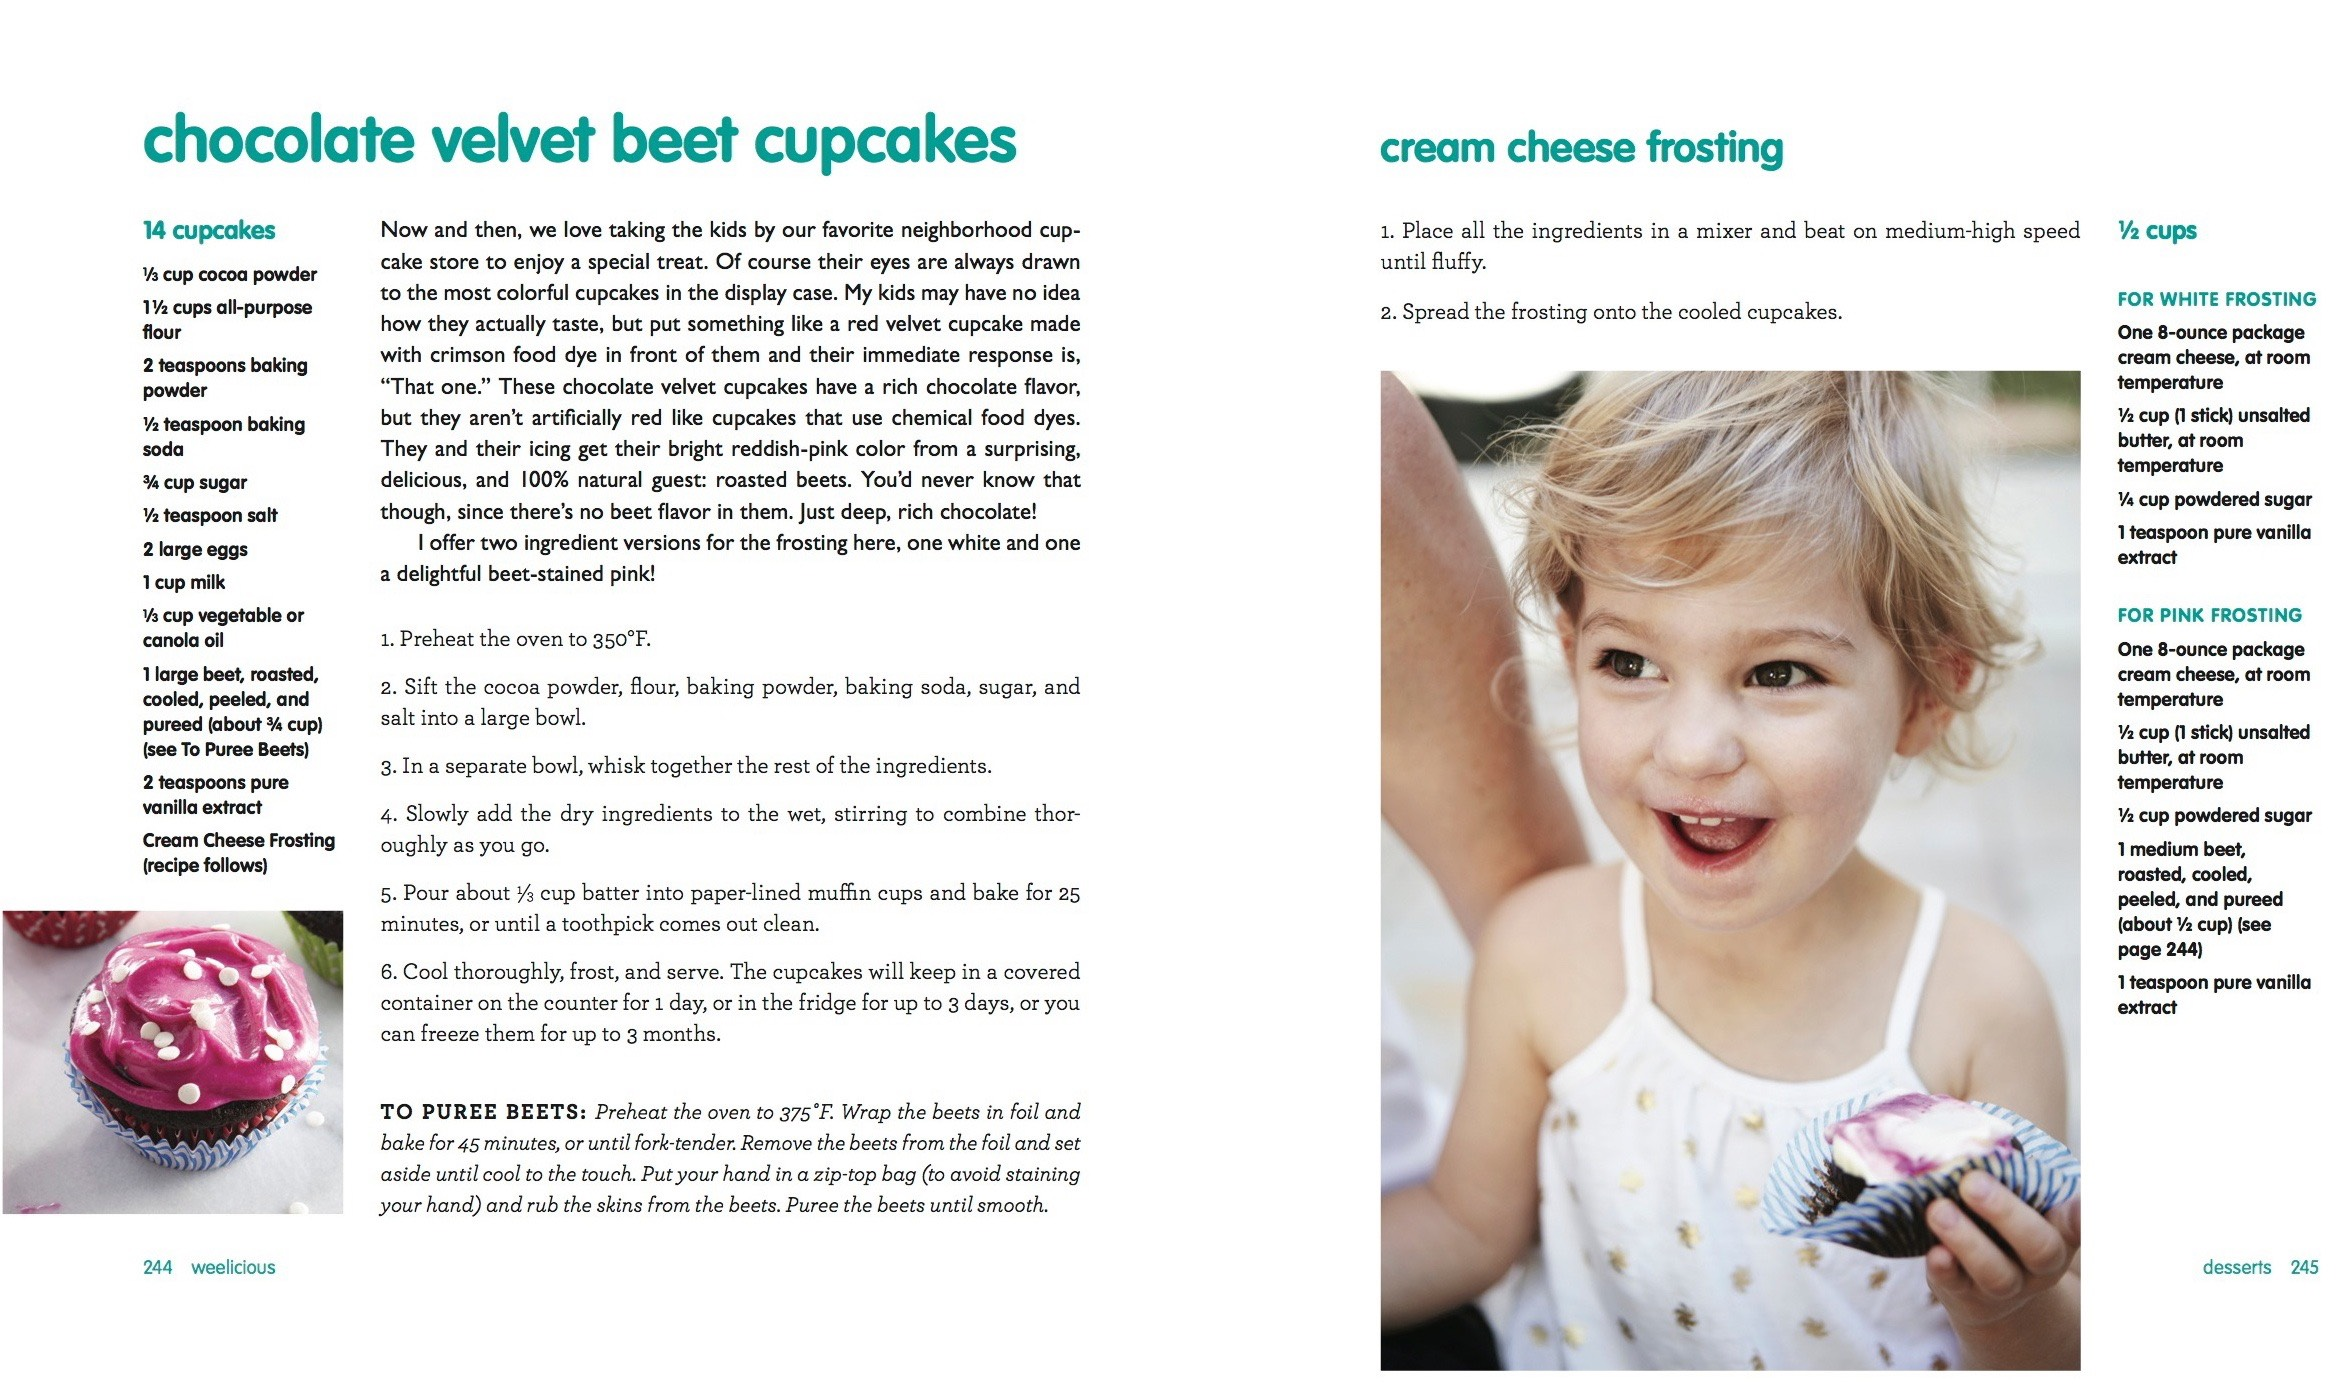 Chocolate Velvet Beet Cupcakes from Weelicious